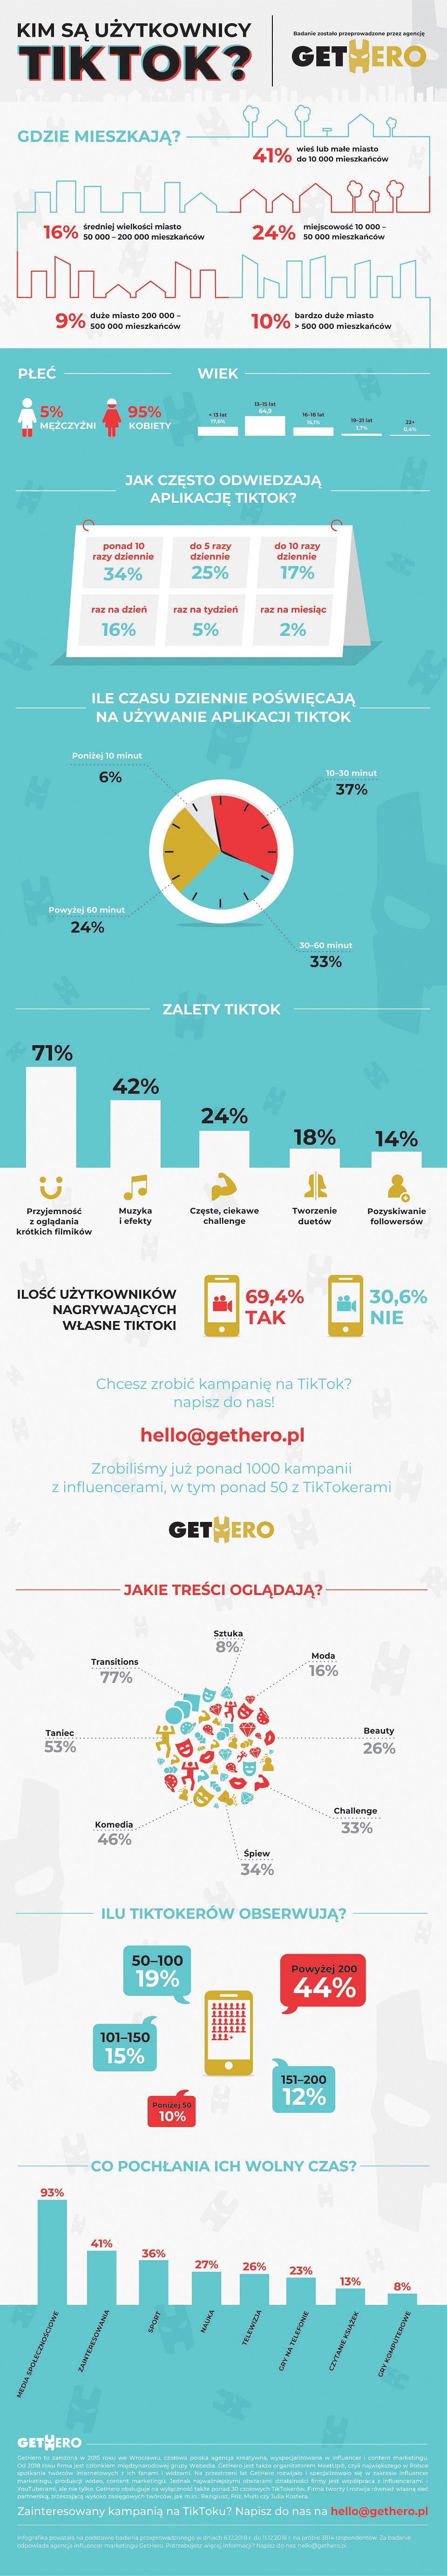 Infografika_TikTok_GetHero_01.2019.jpg